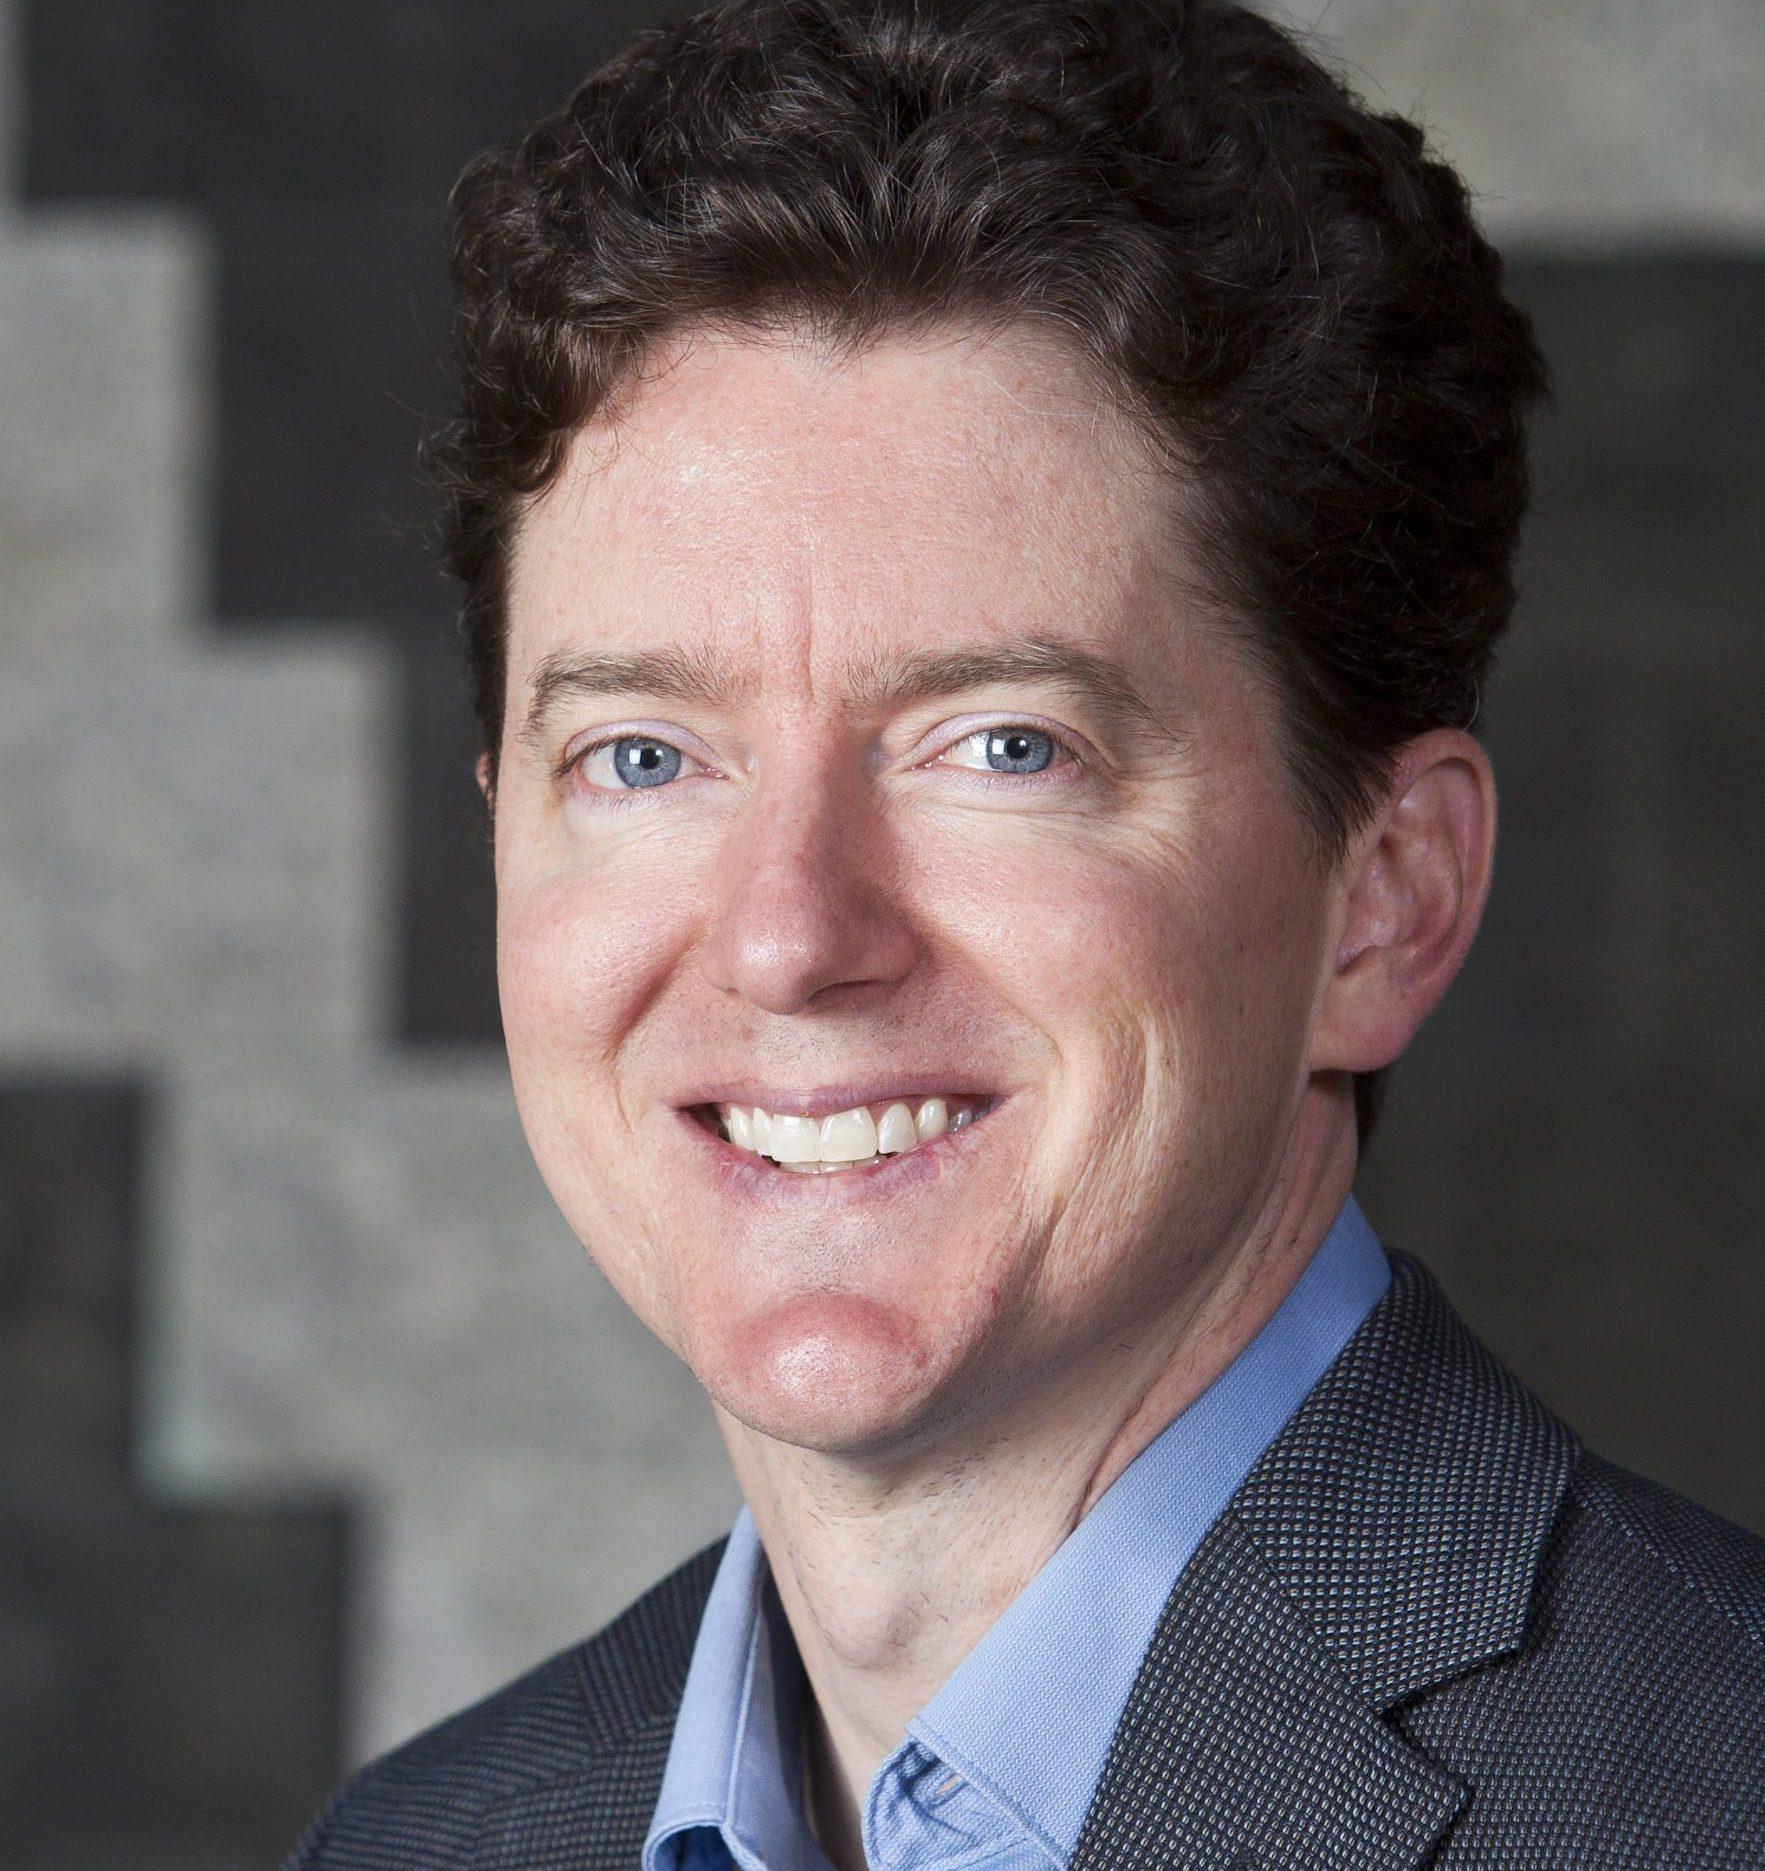 Douglas Harris, Nonresident Senior Fellow